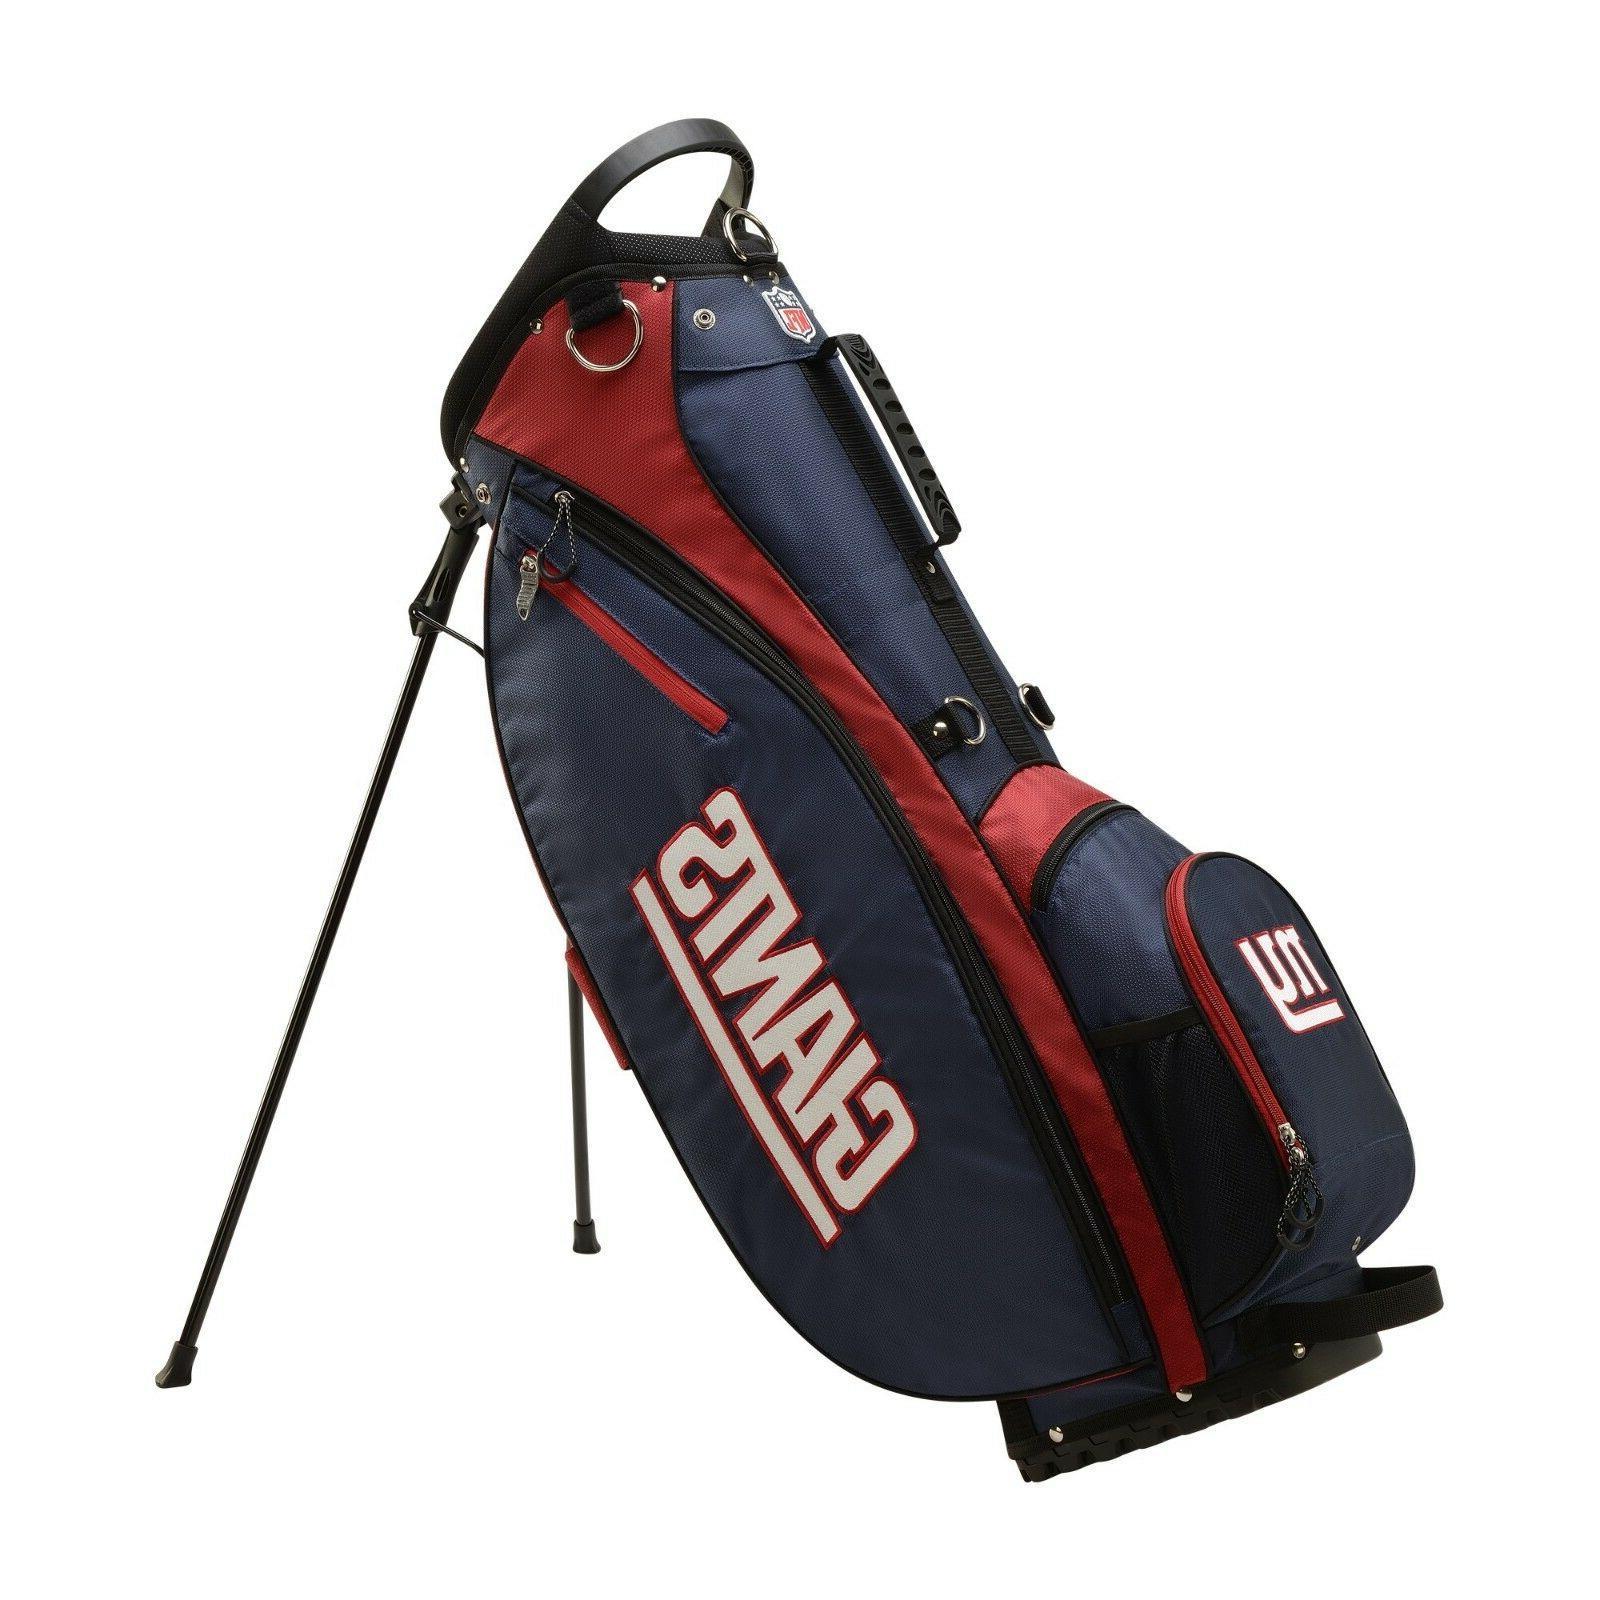 new nfl carry golf bag new york